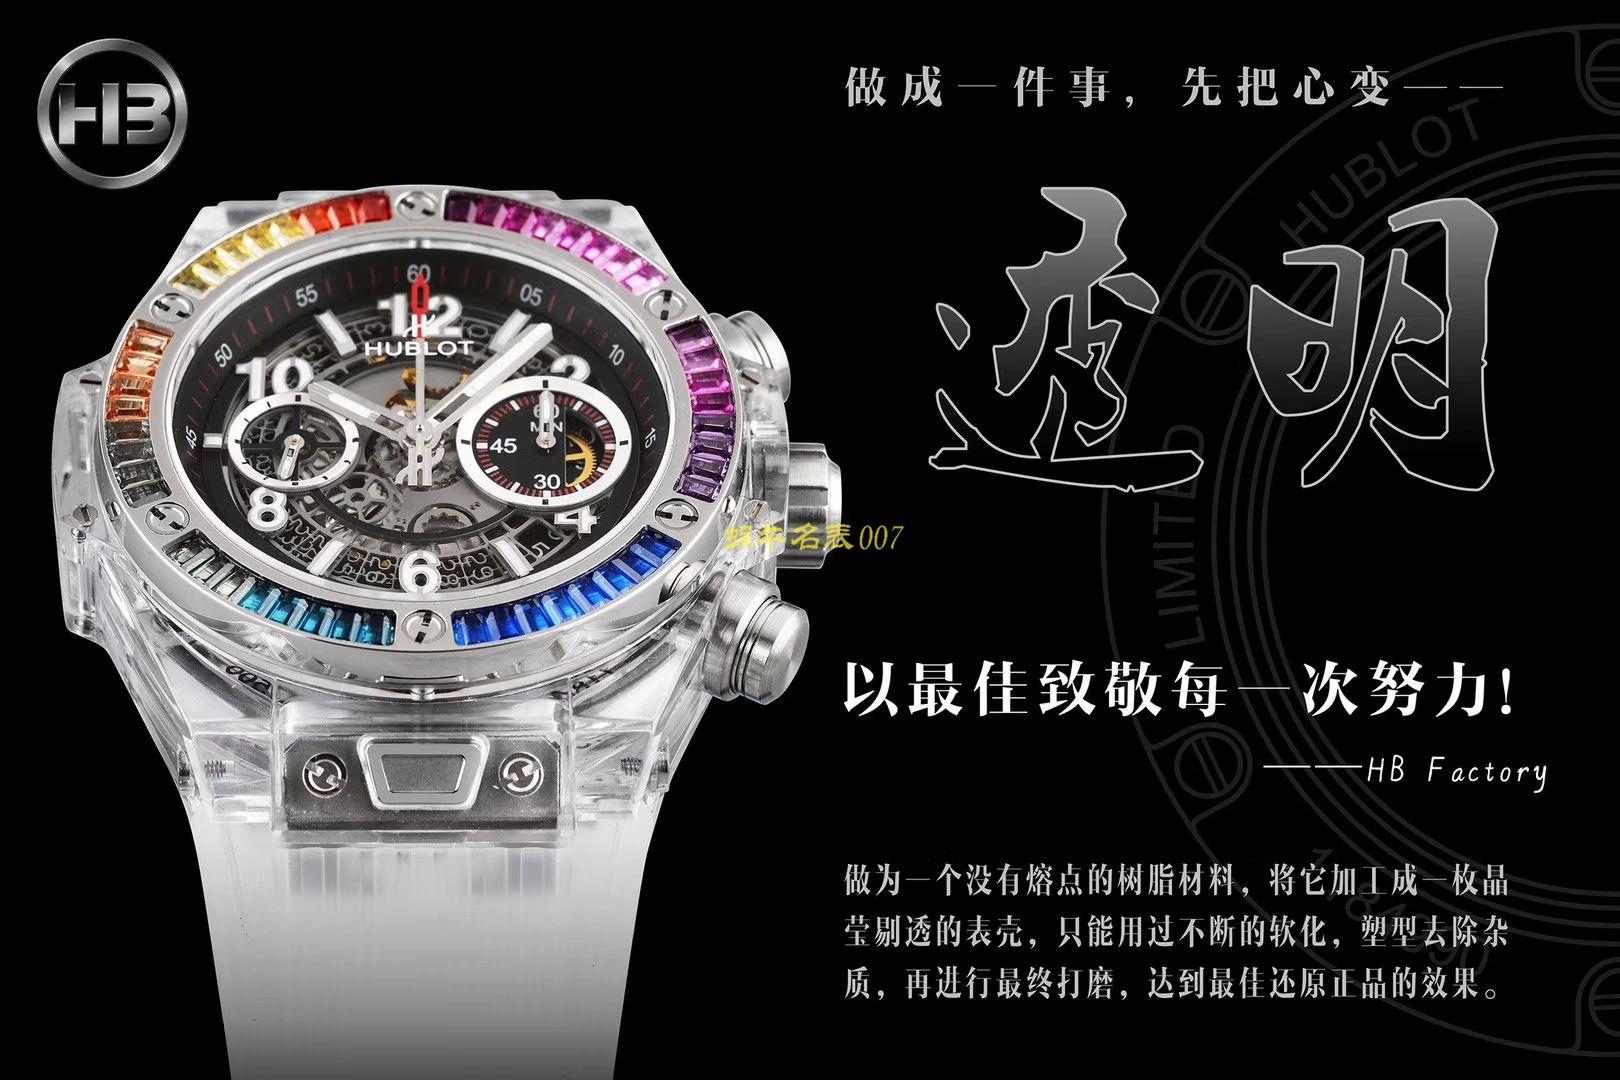 【JB一比一超A高仿手表】宇舶BIG BANG系列411.JX.4802.RT腕表